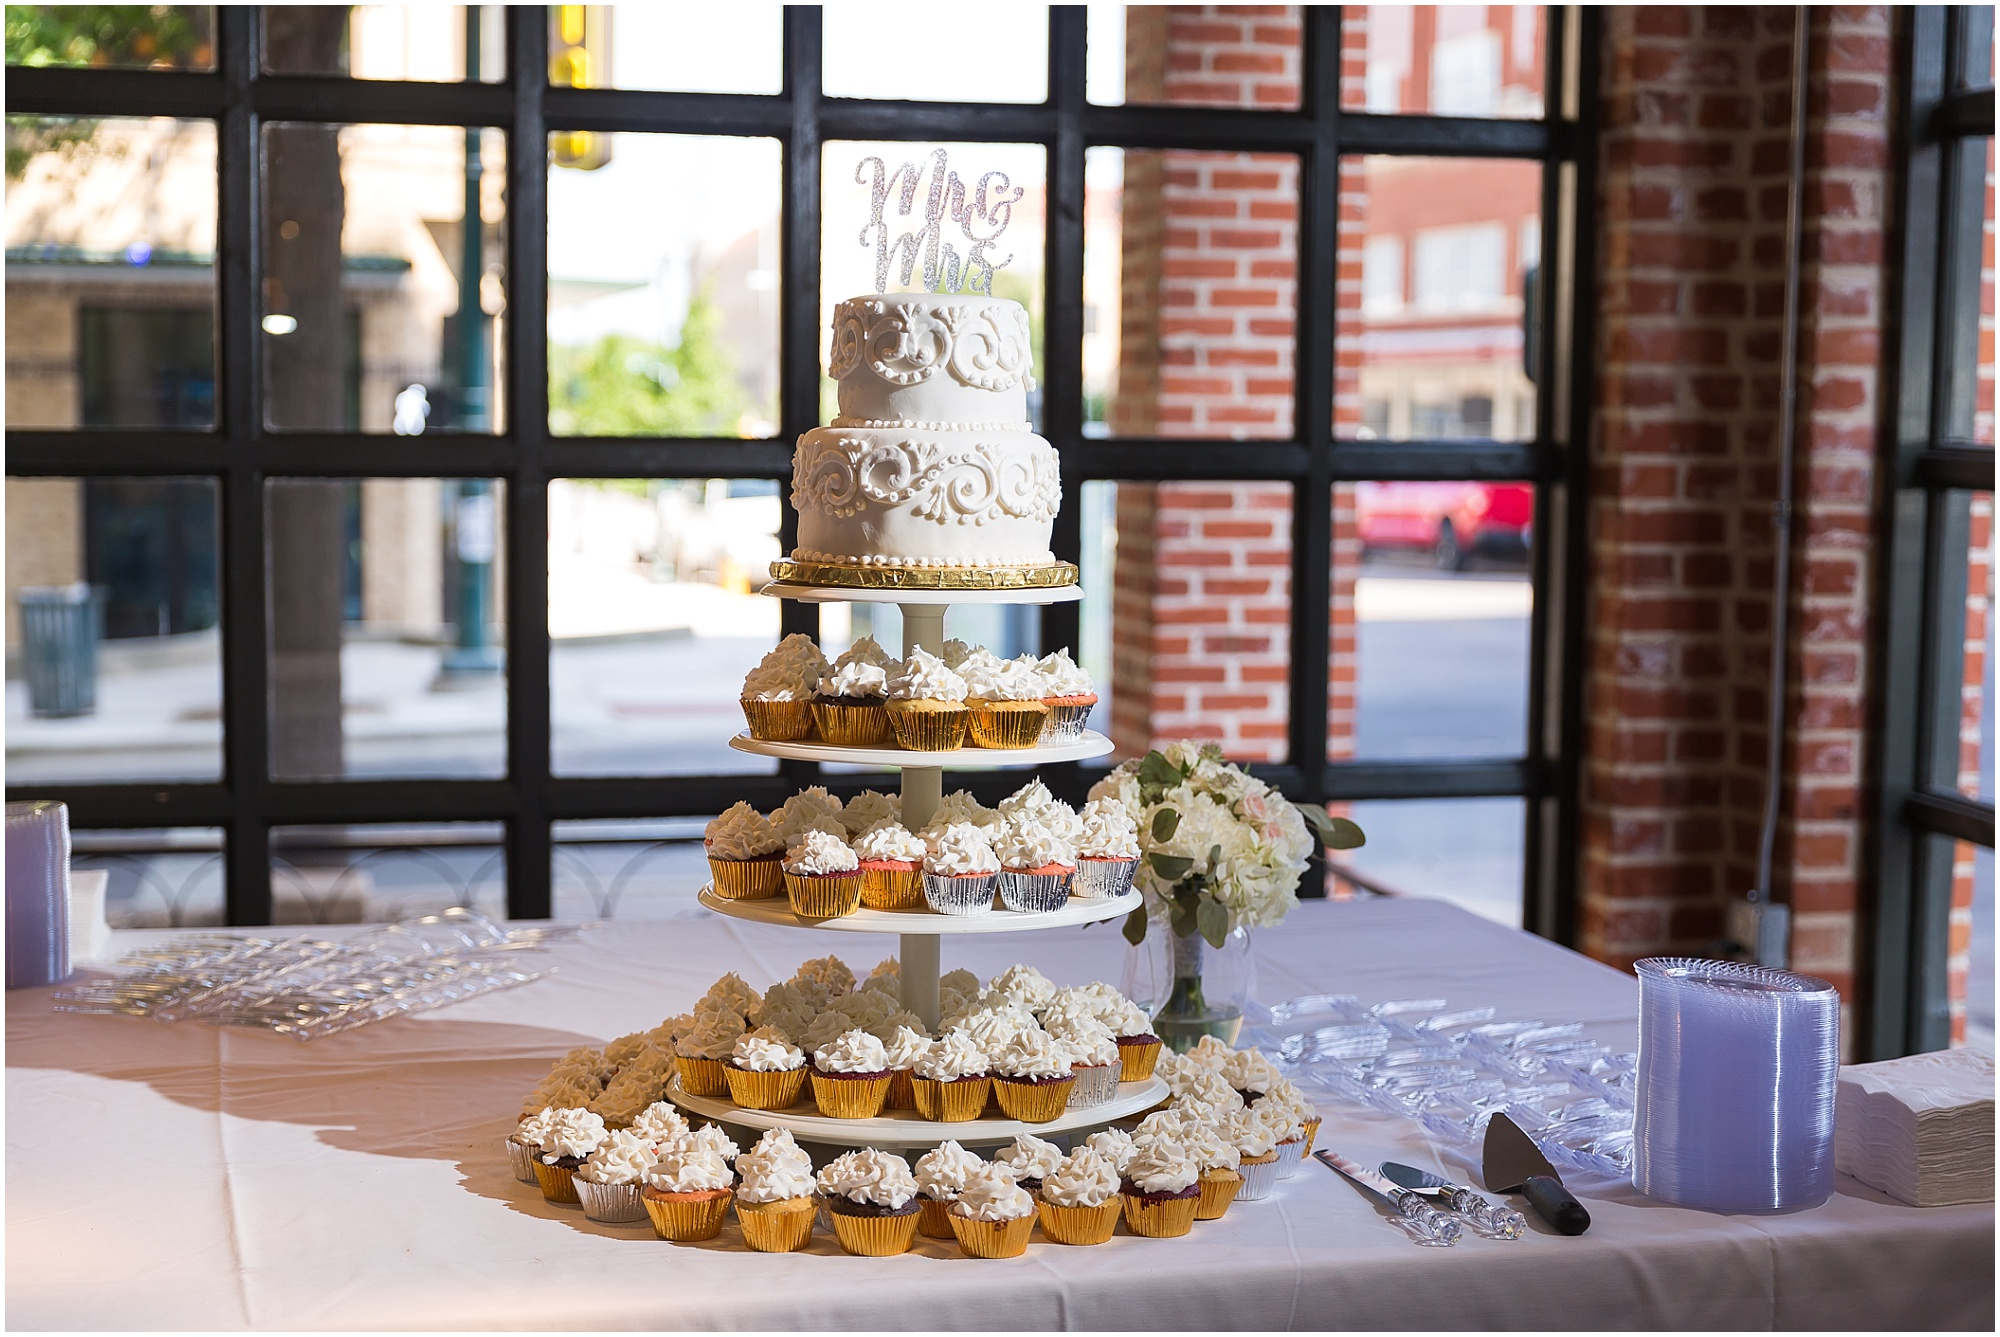 Cake and cupcake display at a warehouse wedding in Waco, Texas - www.jasonandmelaina.com